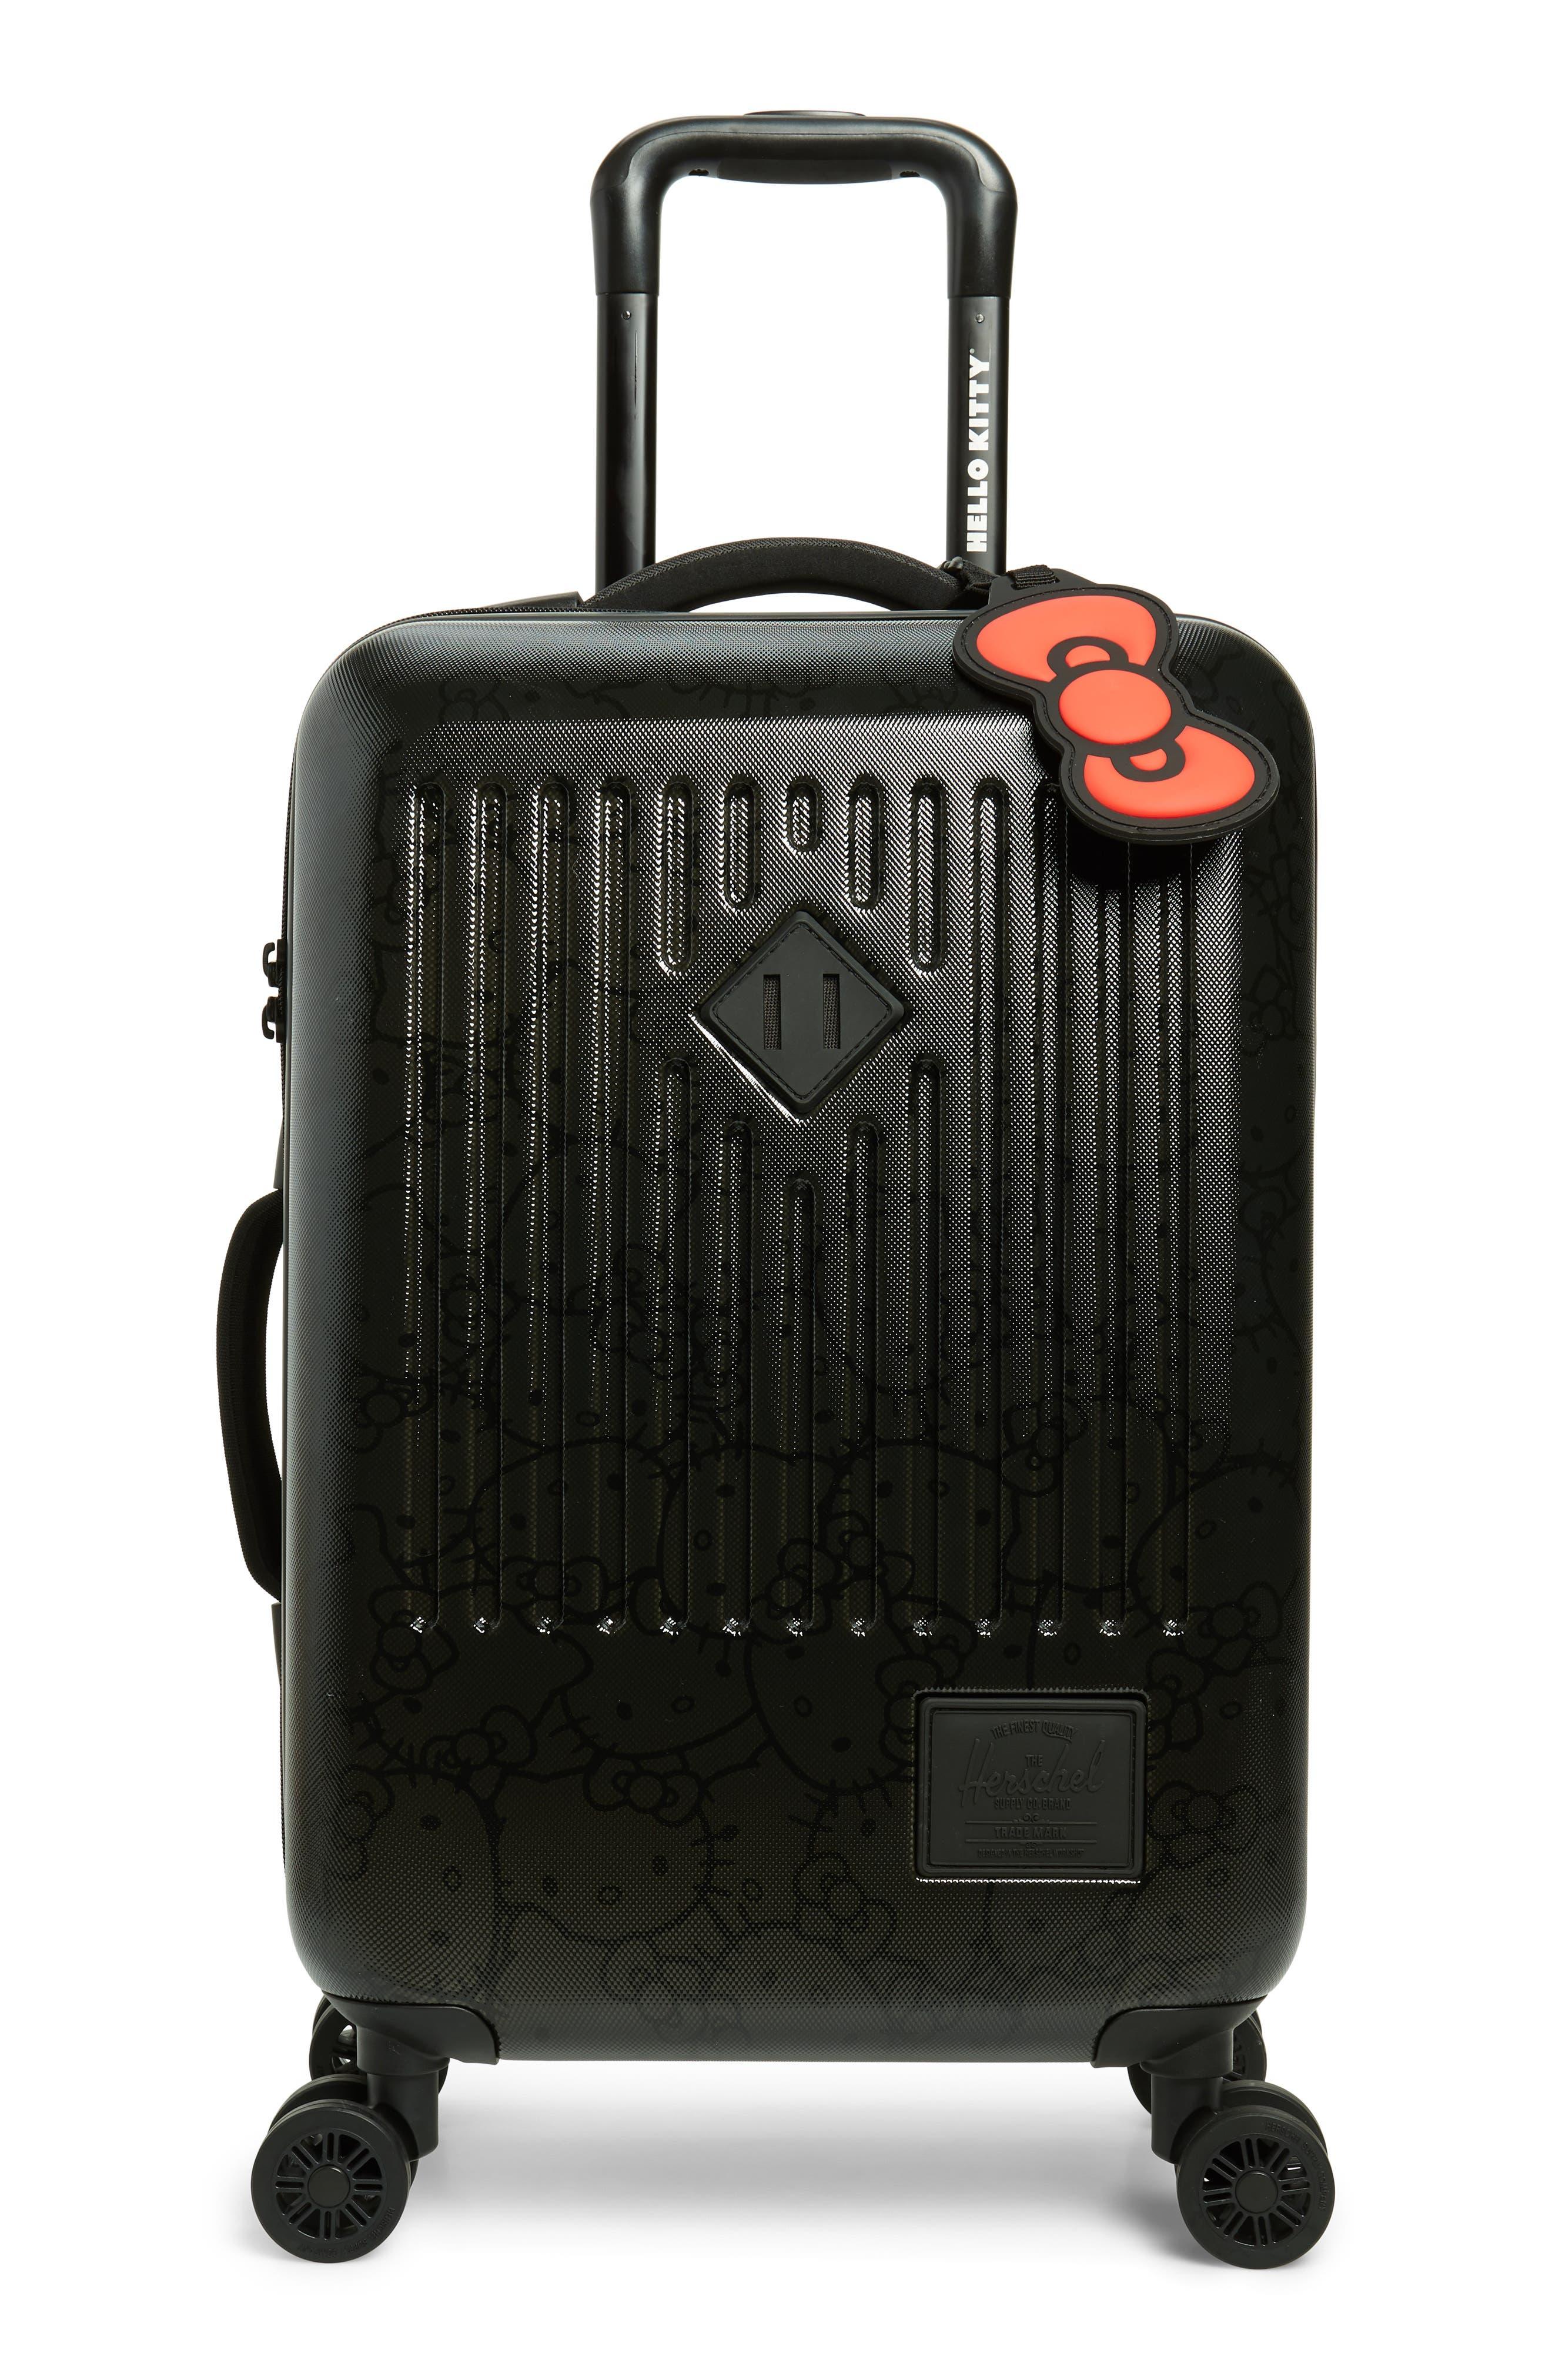 b4d04ca8bf23 Black Luggage & Travel Bags | Nordstrom